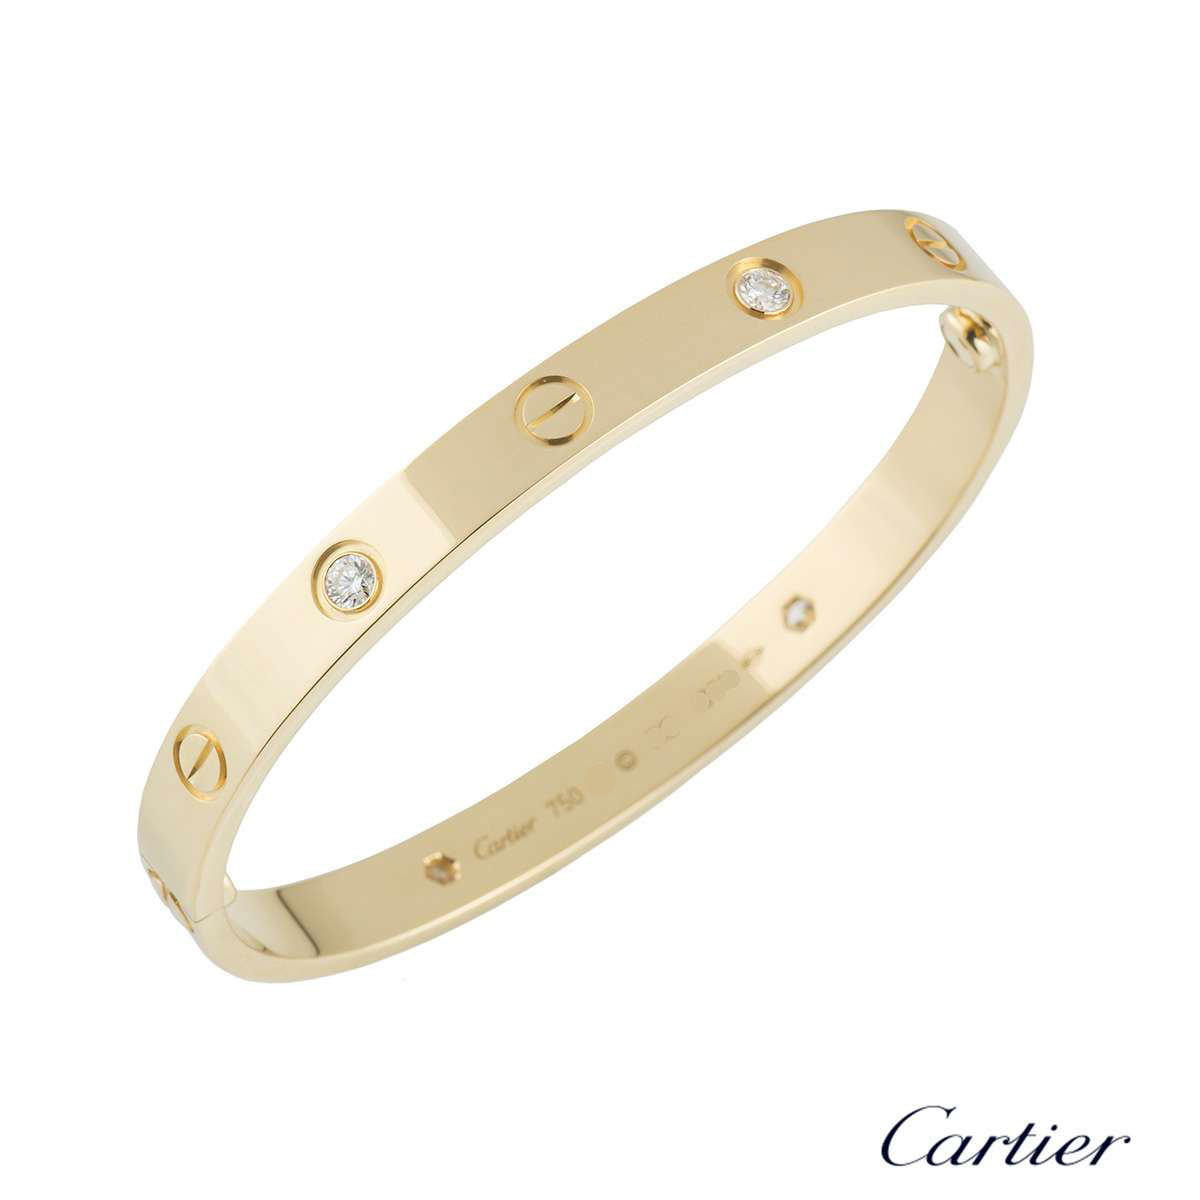 Cartier Yellow Gold Half Diamond Love Bracelet Size 19B6035919